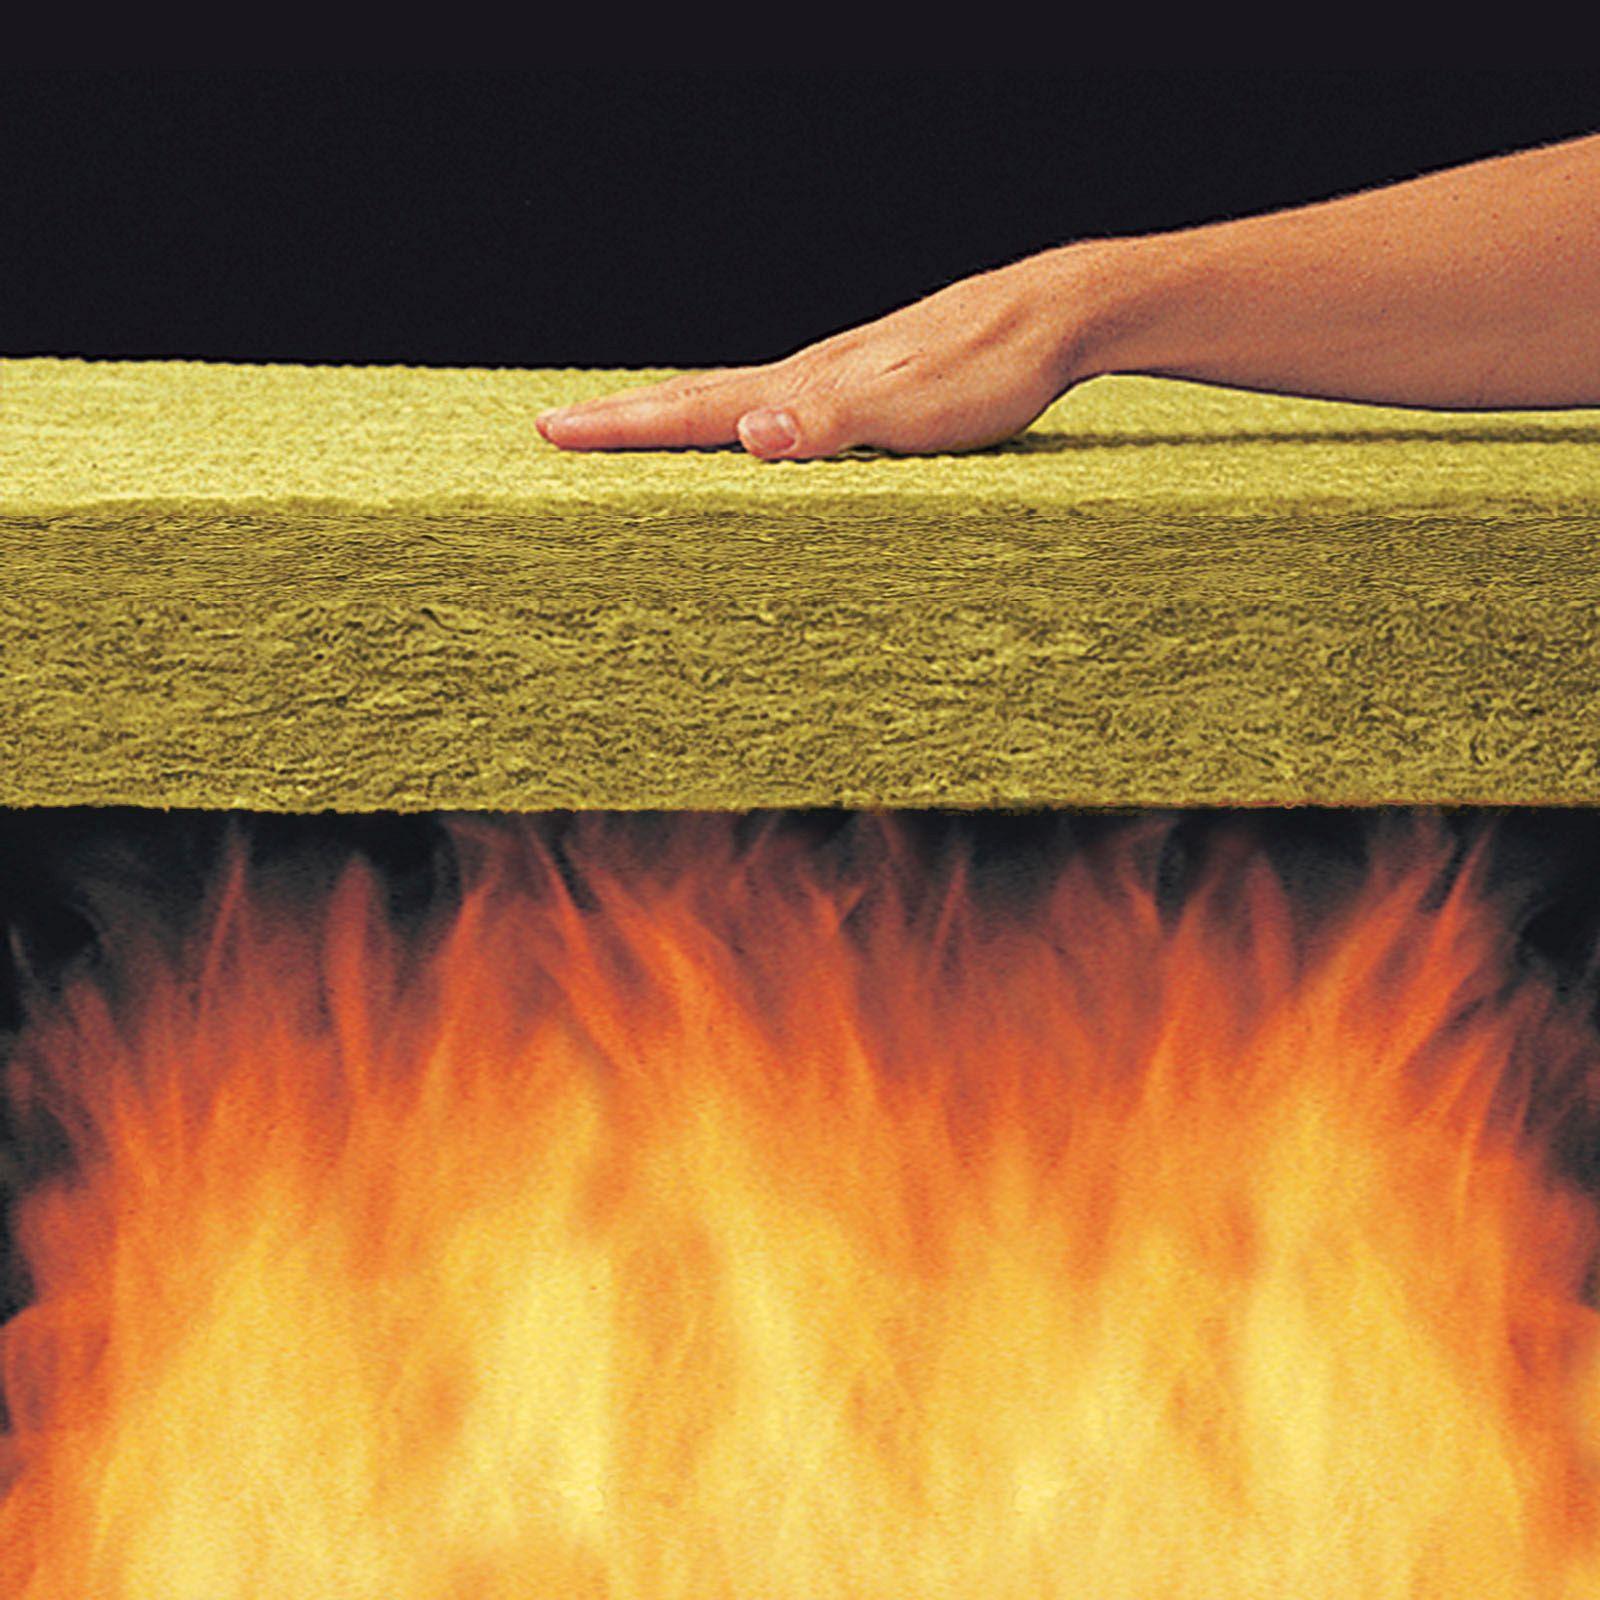 wdvs fassadend mmung optimaler brandschutz beim d mmen. Black Bedroom Furniture Sets. Home Design Ideas